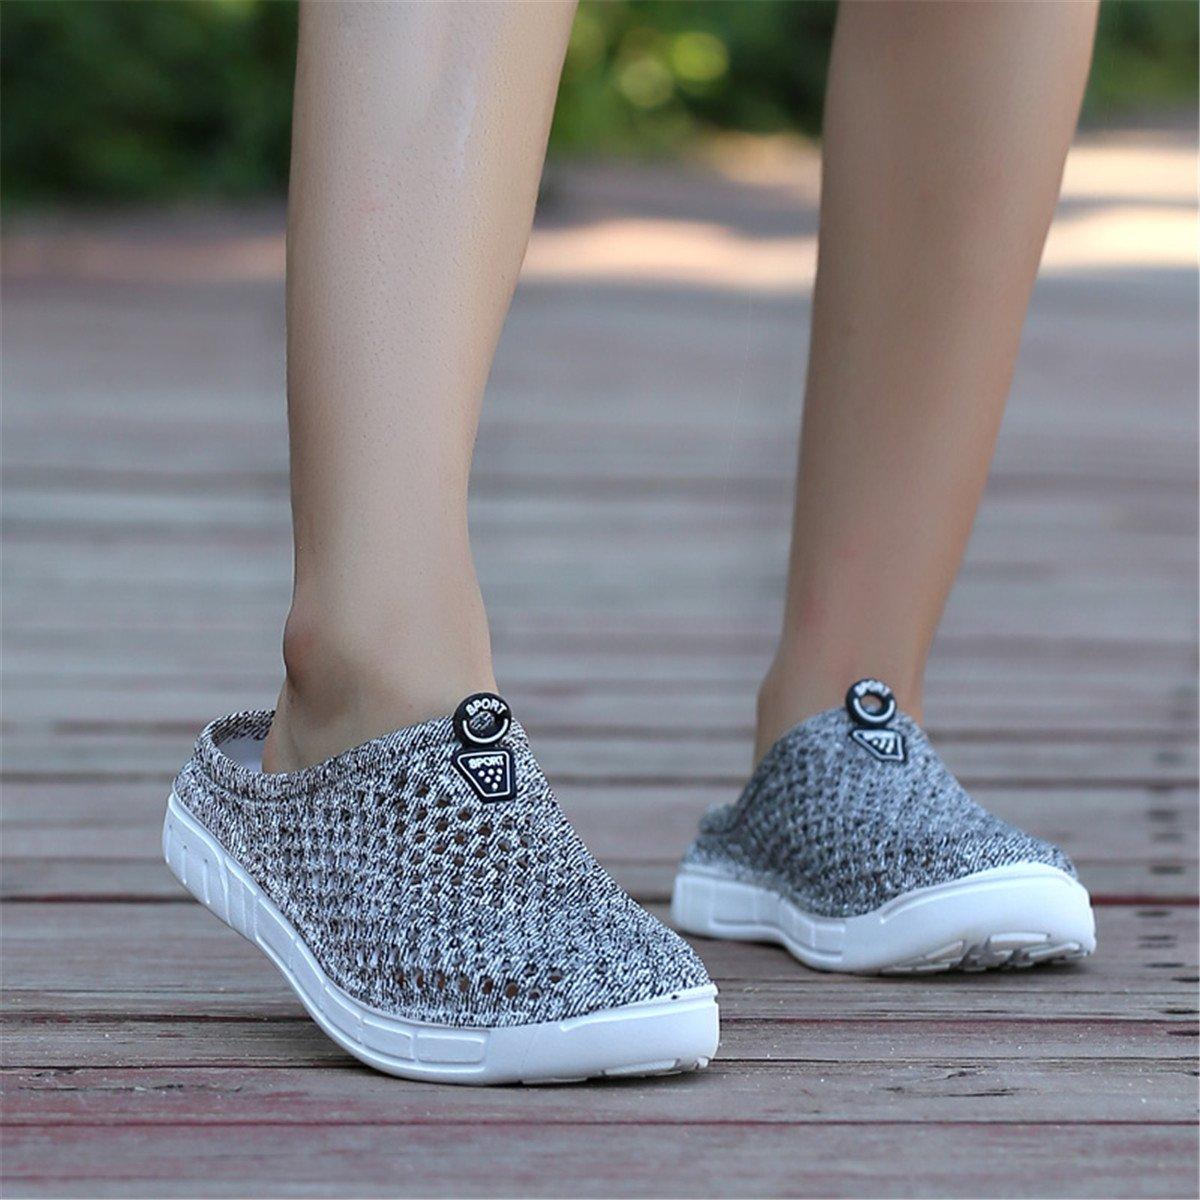 Ginjang Women's Garden Clogs Shoes Slip-on Slippers Sandals(38/Gray) by Ginjang (Image #6)